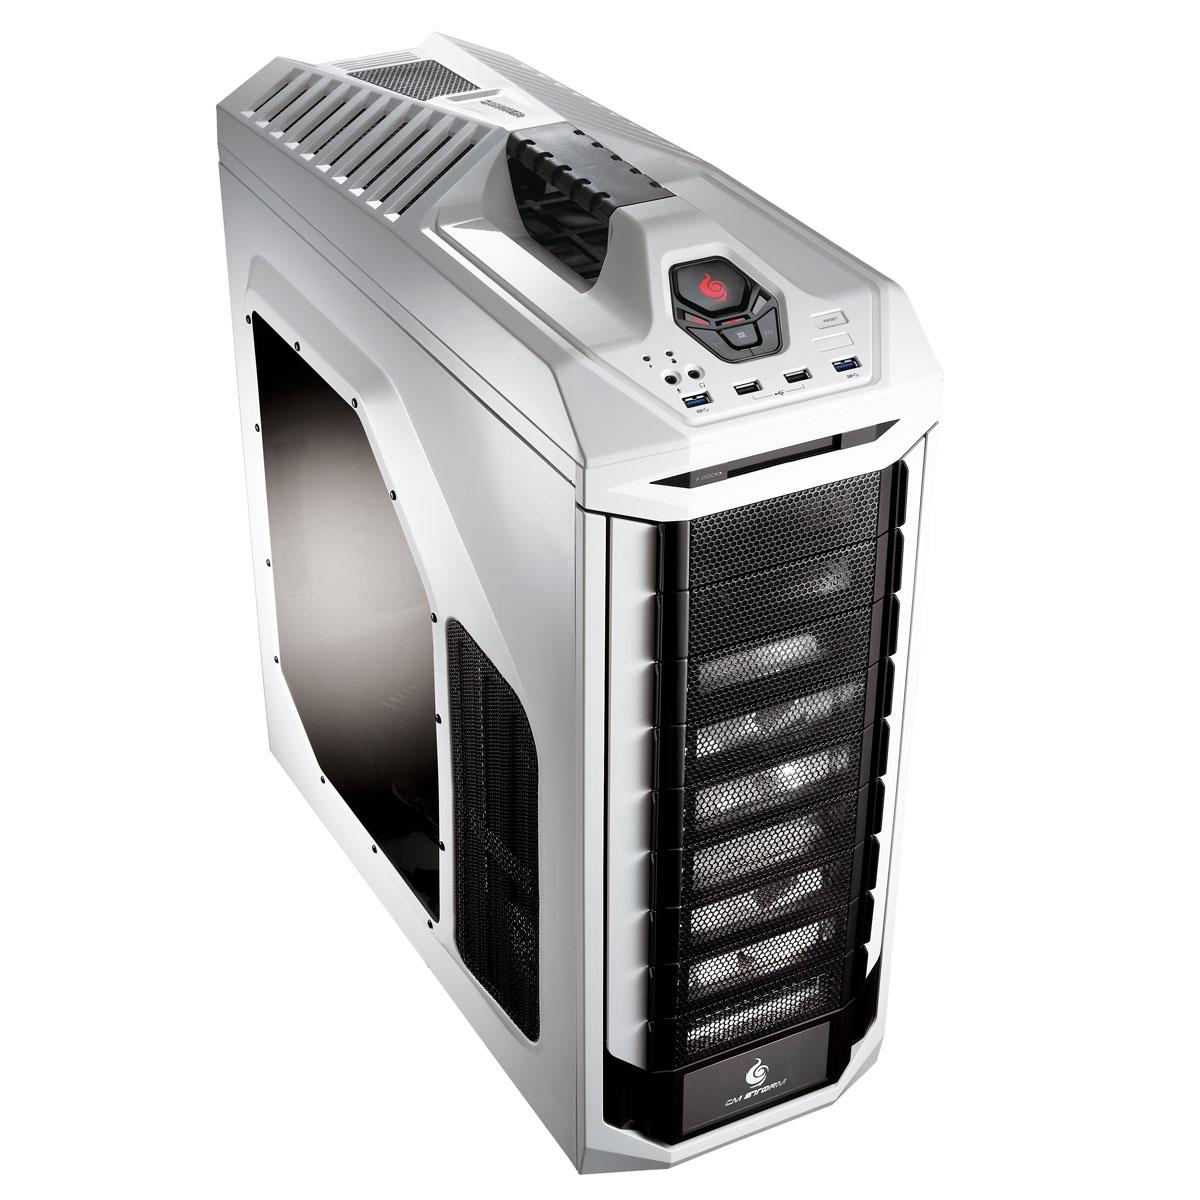 PC de bureau LDLC PC7 Fragmenta Intel Core i5-4690K 8 Go SSD 250 Go + HDD 2 To NVIDIA GeForce GTX 980 4 Go Graveur DVD  Windows 7 Premium 64 bits